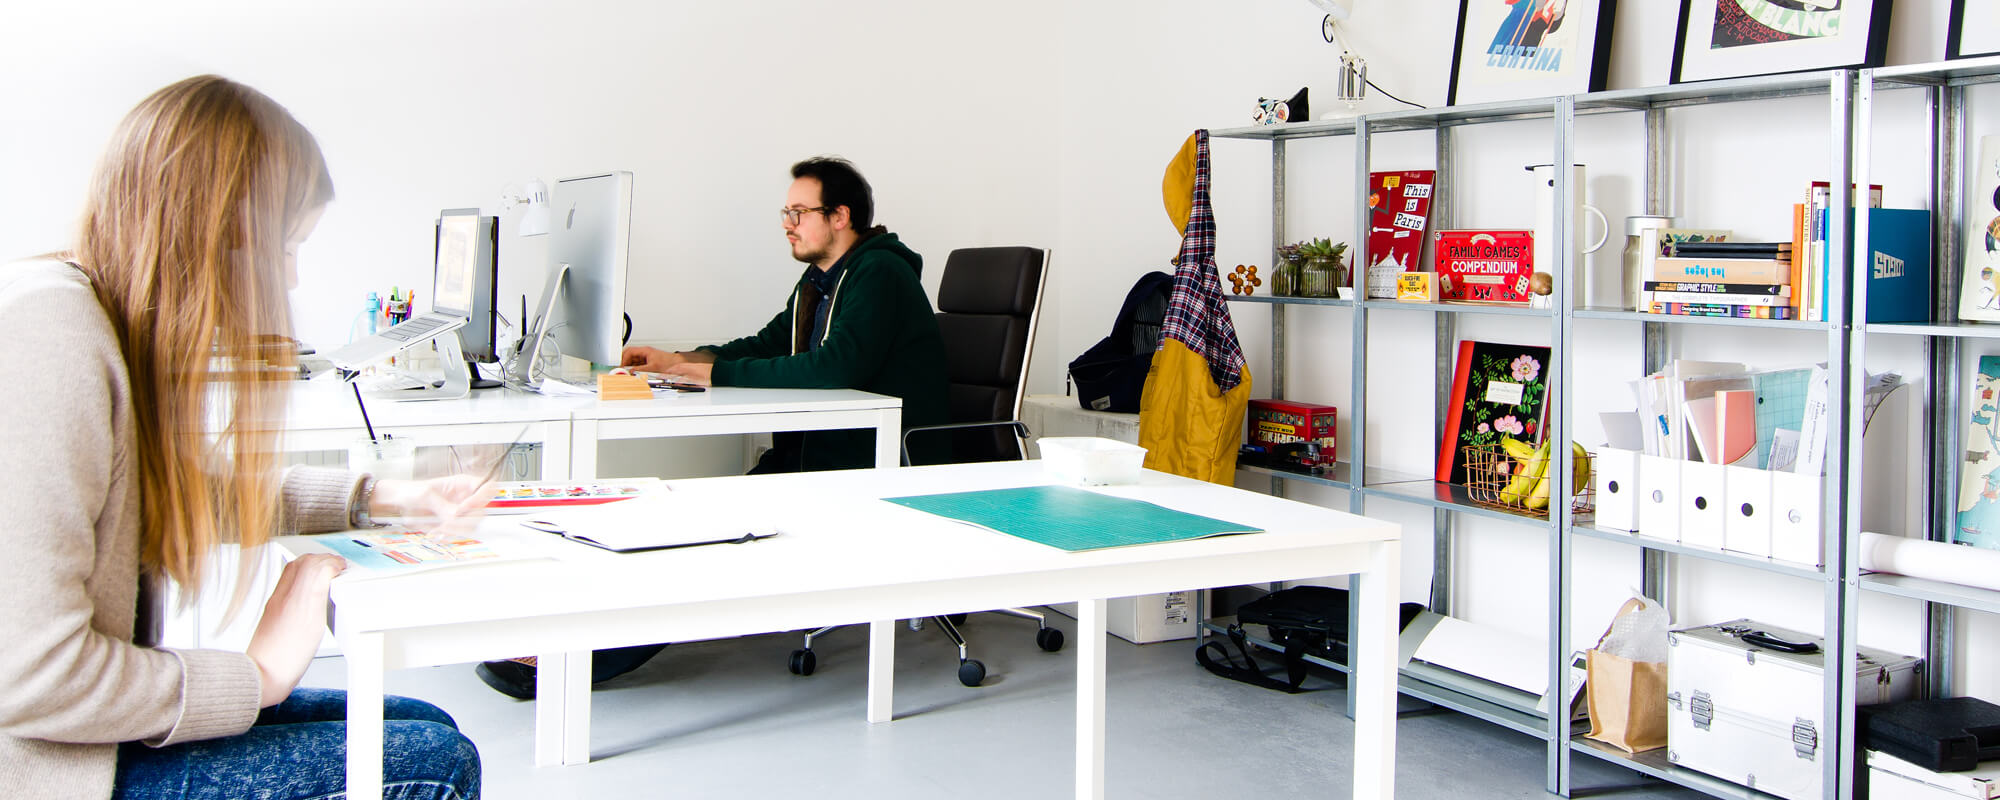 utilityhouse-bristol-office-space1.jpg